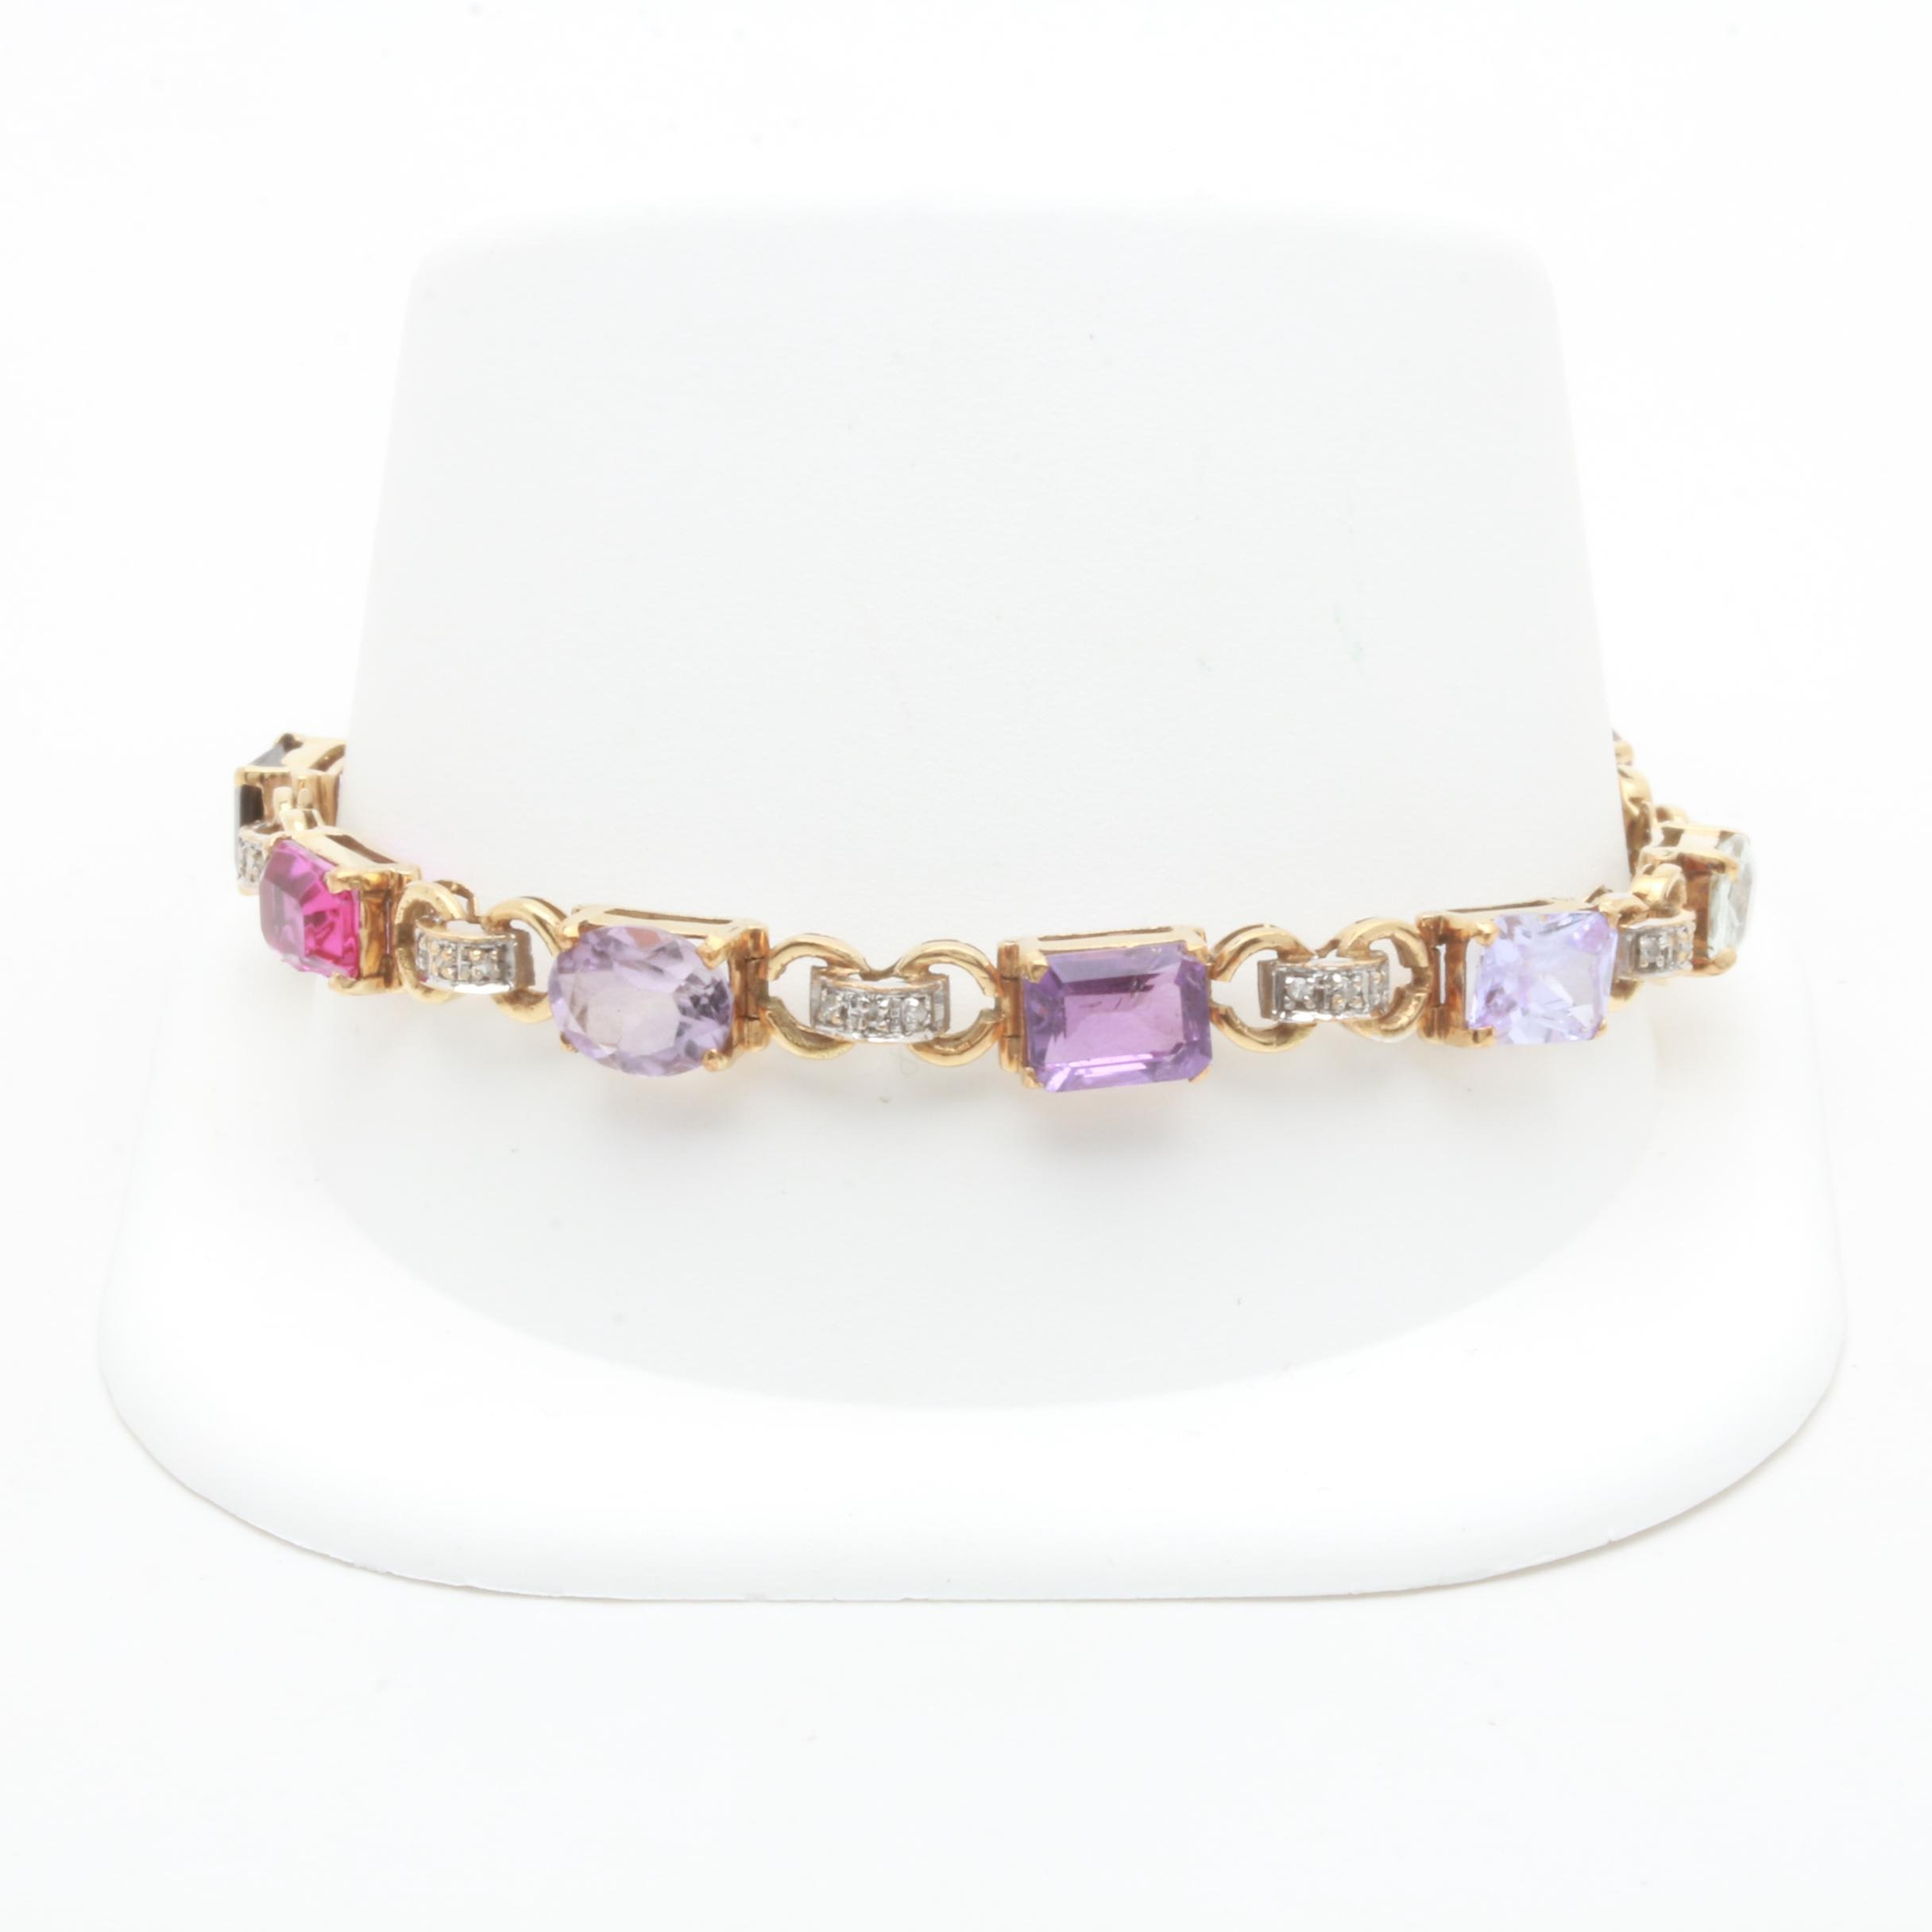 14K Yellow Gold Diamond and Multi-Gemstone Tennis Bracelet